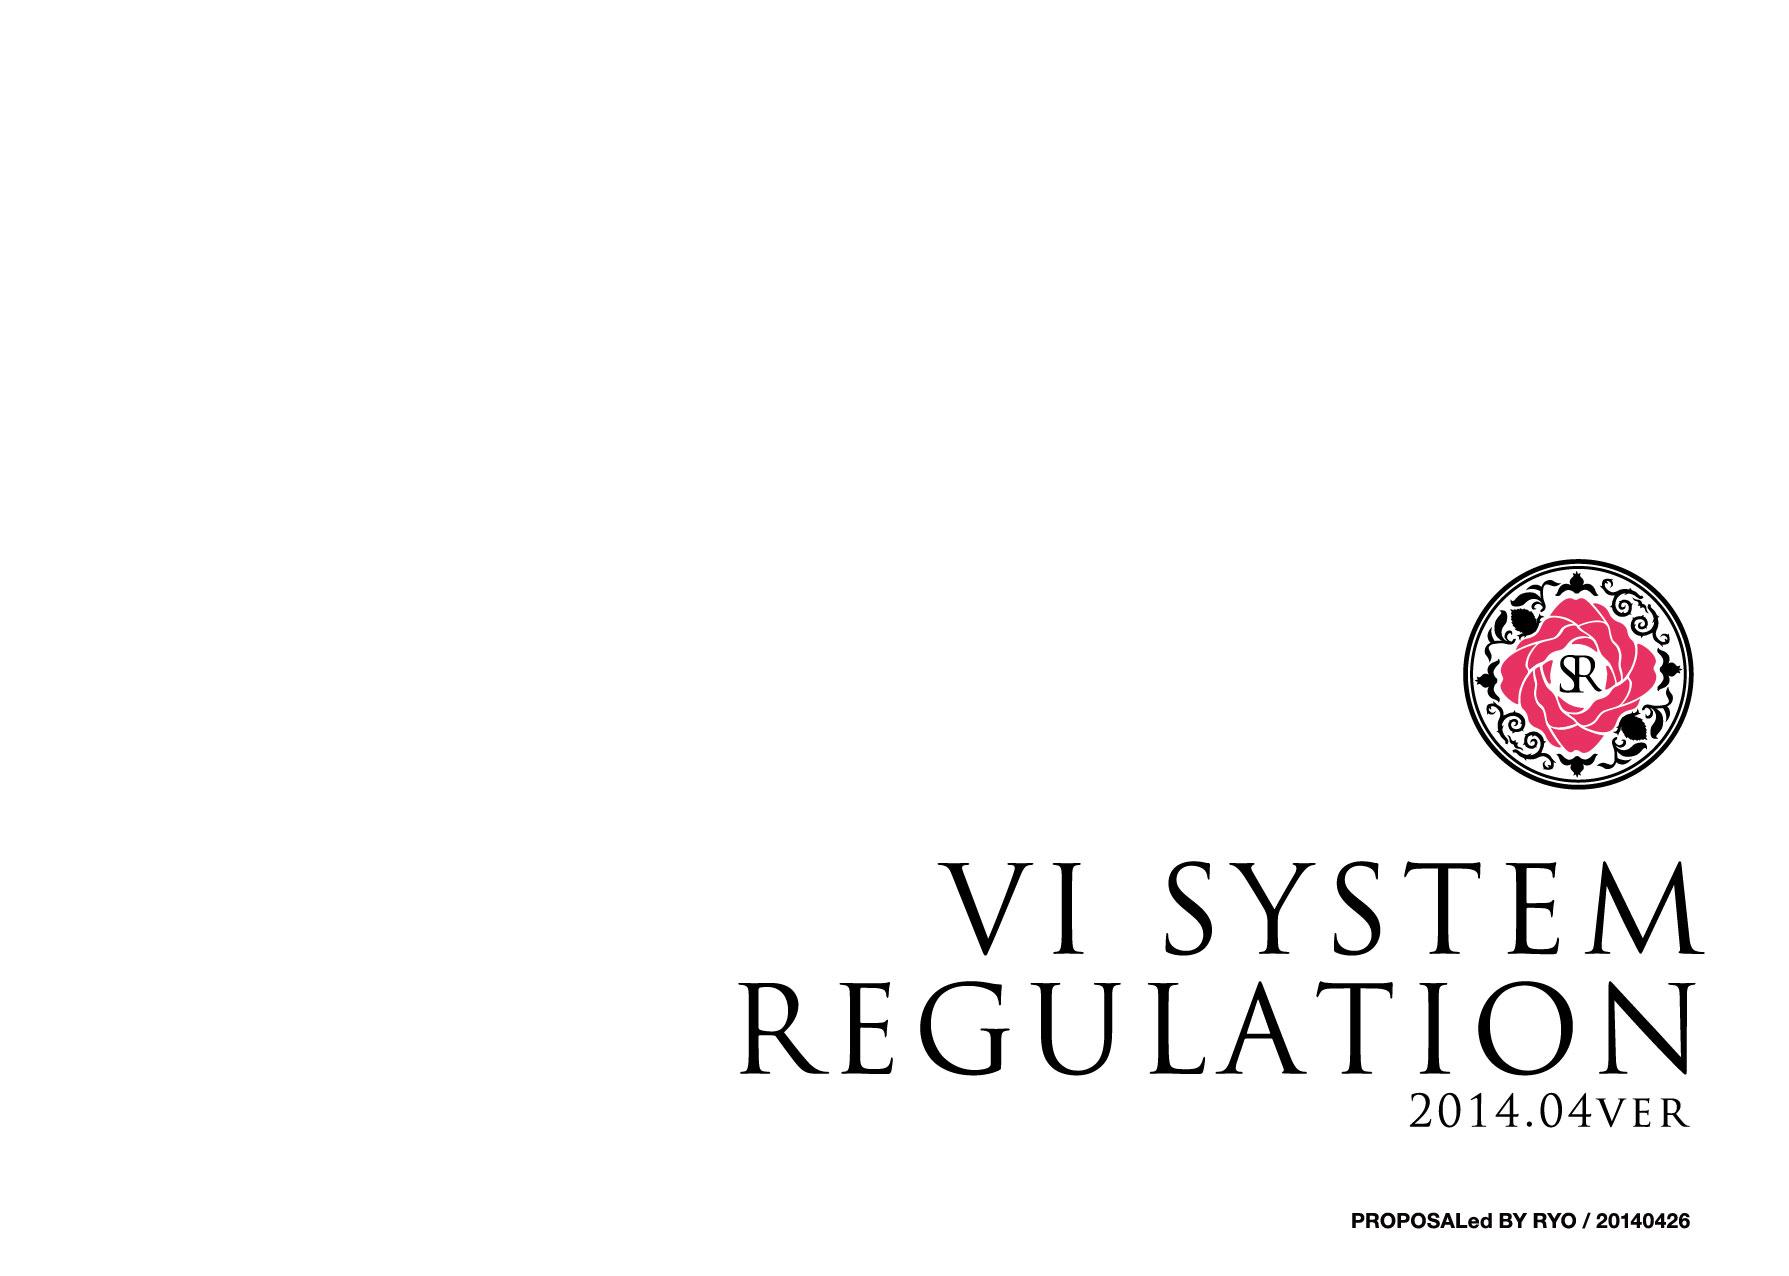 Shanghai Rose : VI SYSTEM REGULATION